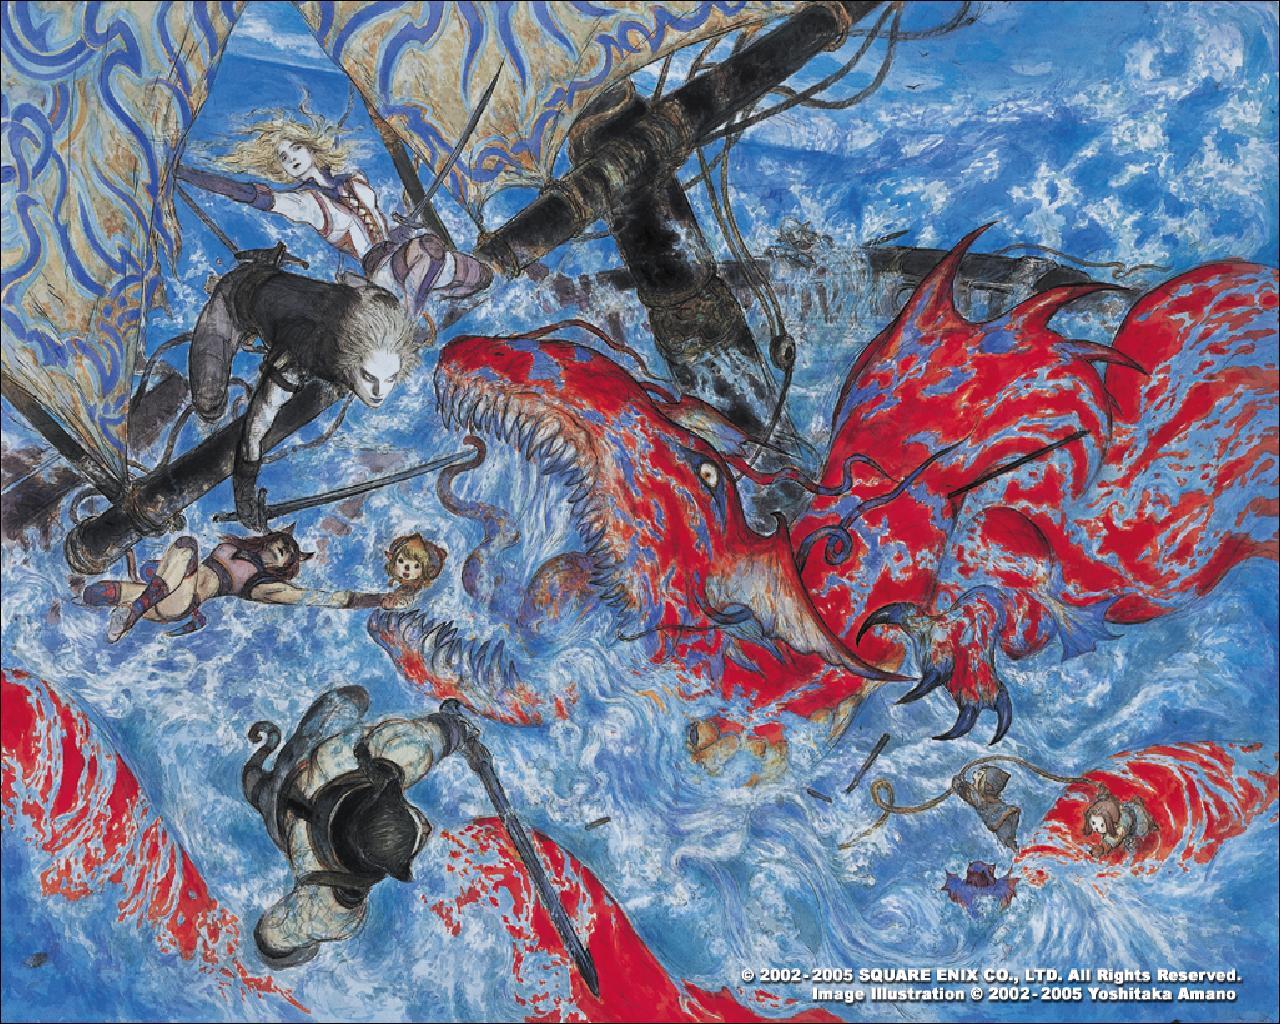 FFXI Wallpaper 1 of 5 by goukai 1280x1024